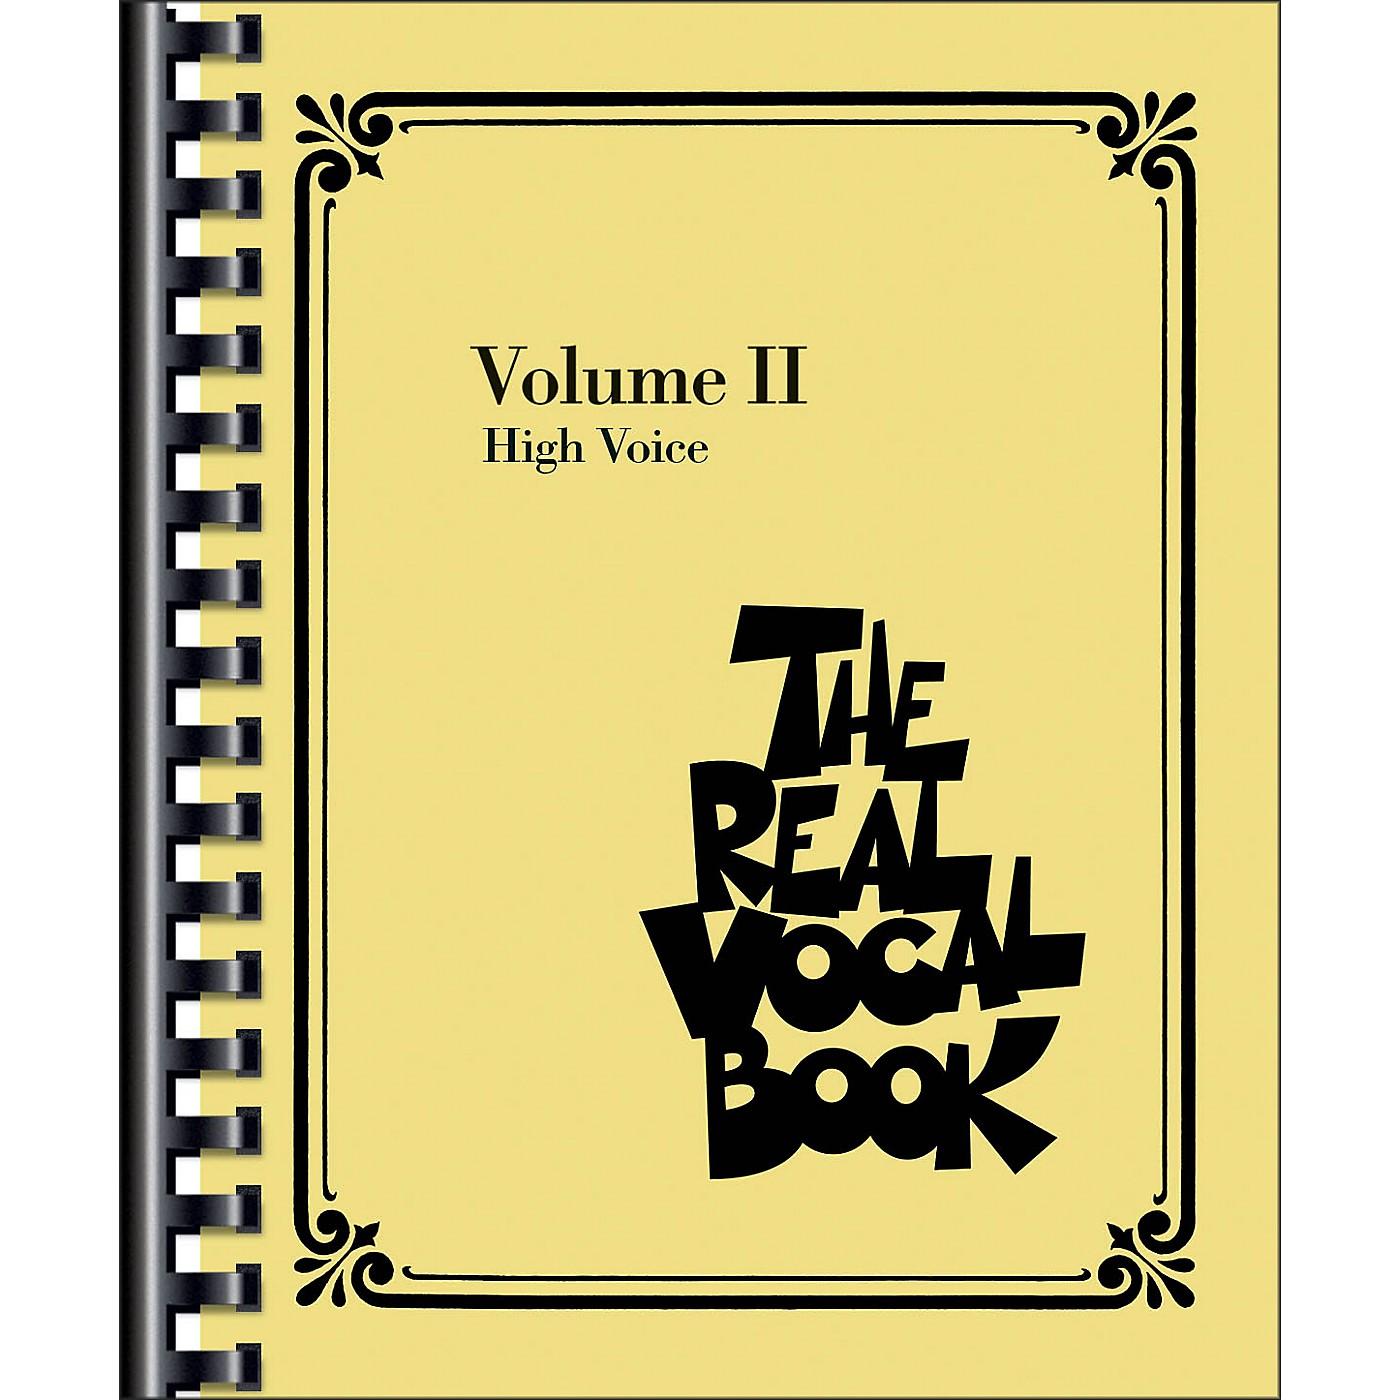 Hal Leonard The Real Vocal Book - Volume 2 thumbnail